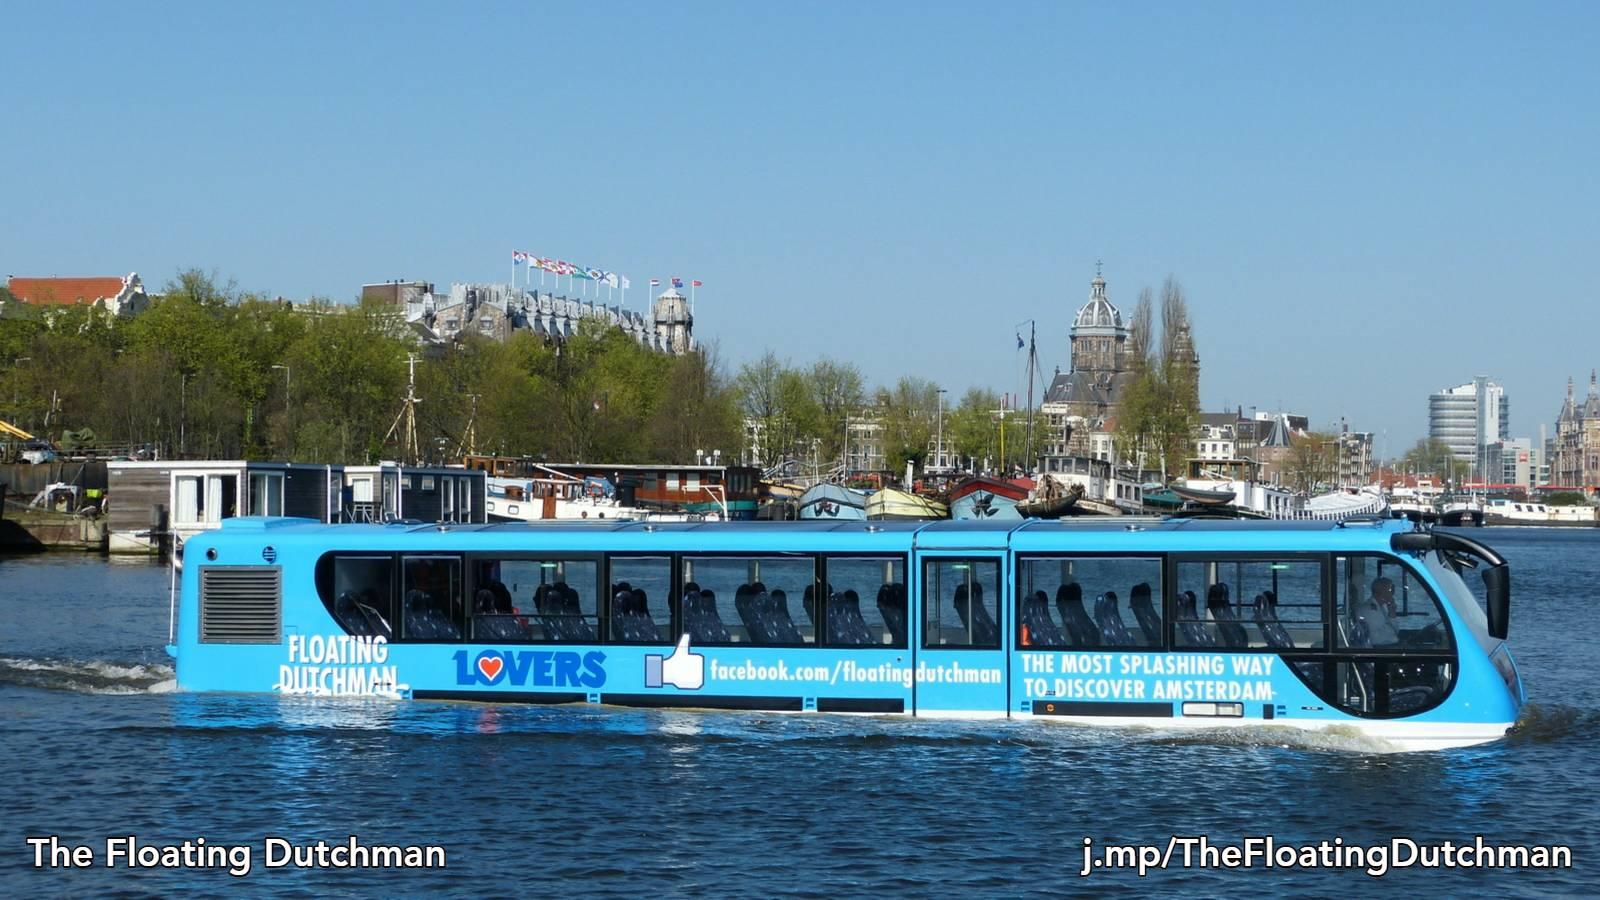 Floating Dutchman tours